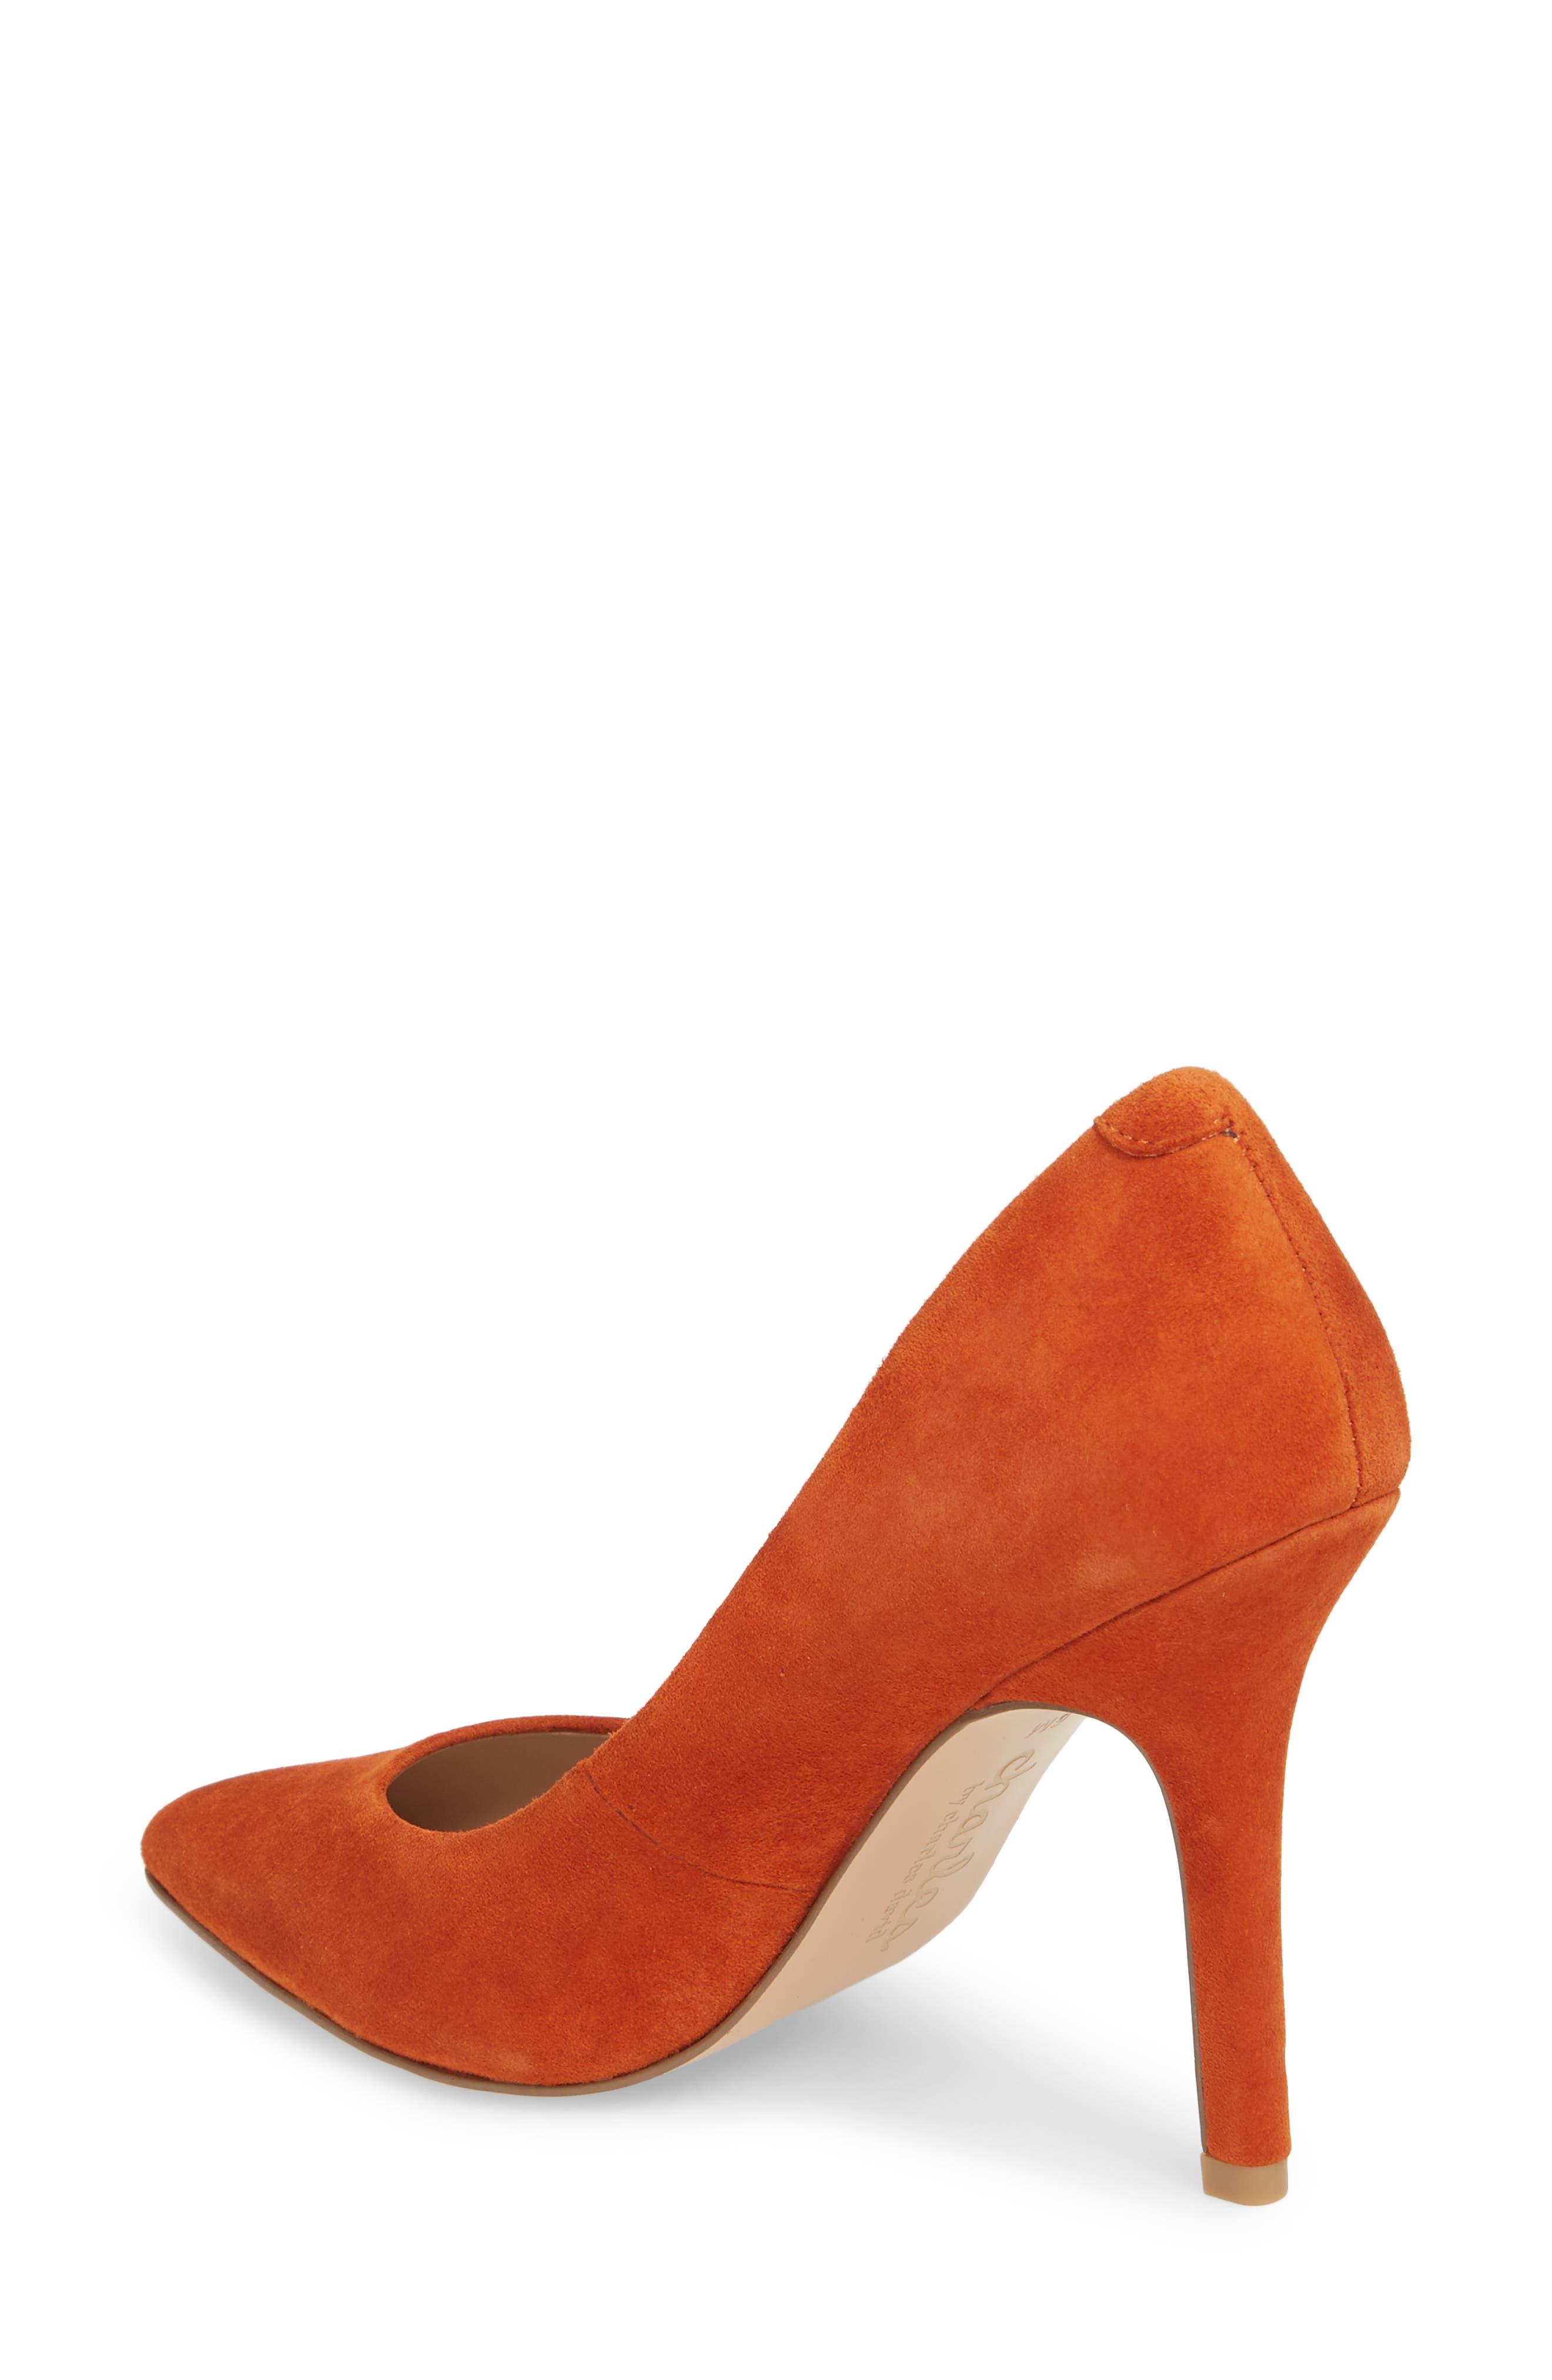 Maxx Pointy Toe Pump,                             Alternate thumbnail 2, color,                             Orange Suede